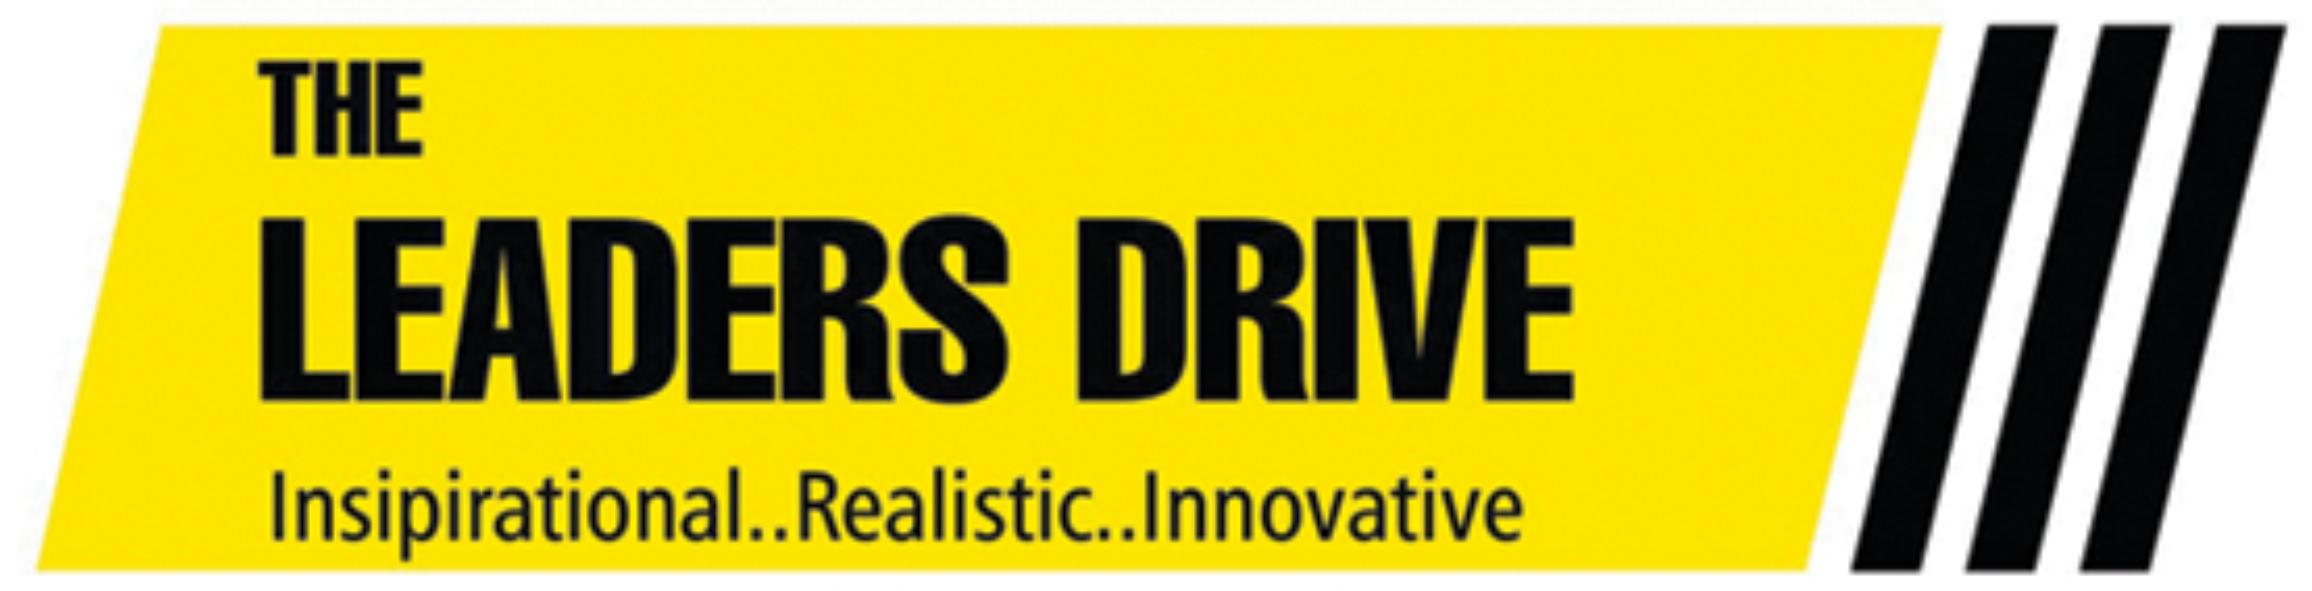 RRAM ASSOCIATES Innovative Business Solution